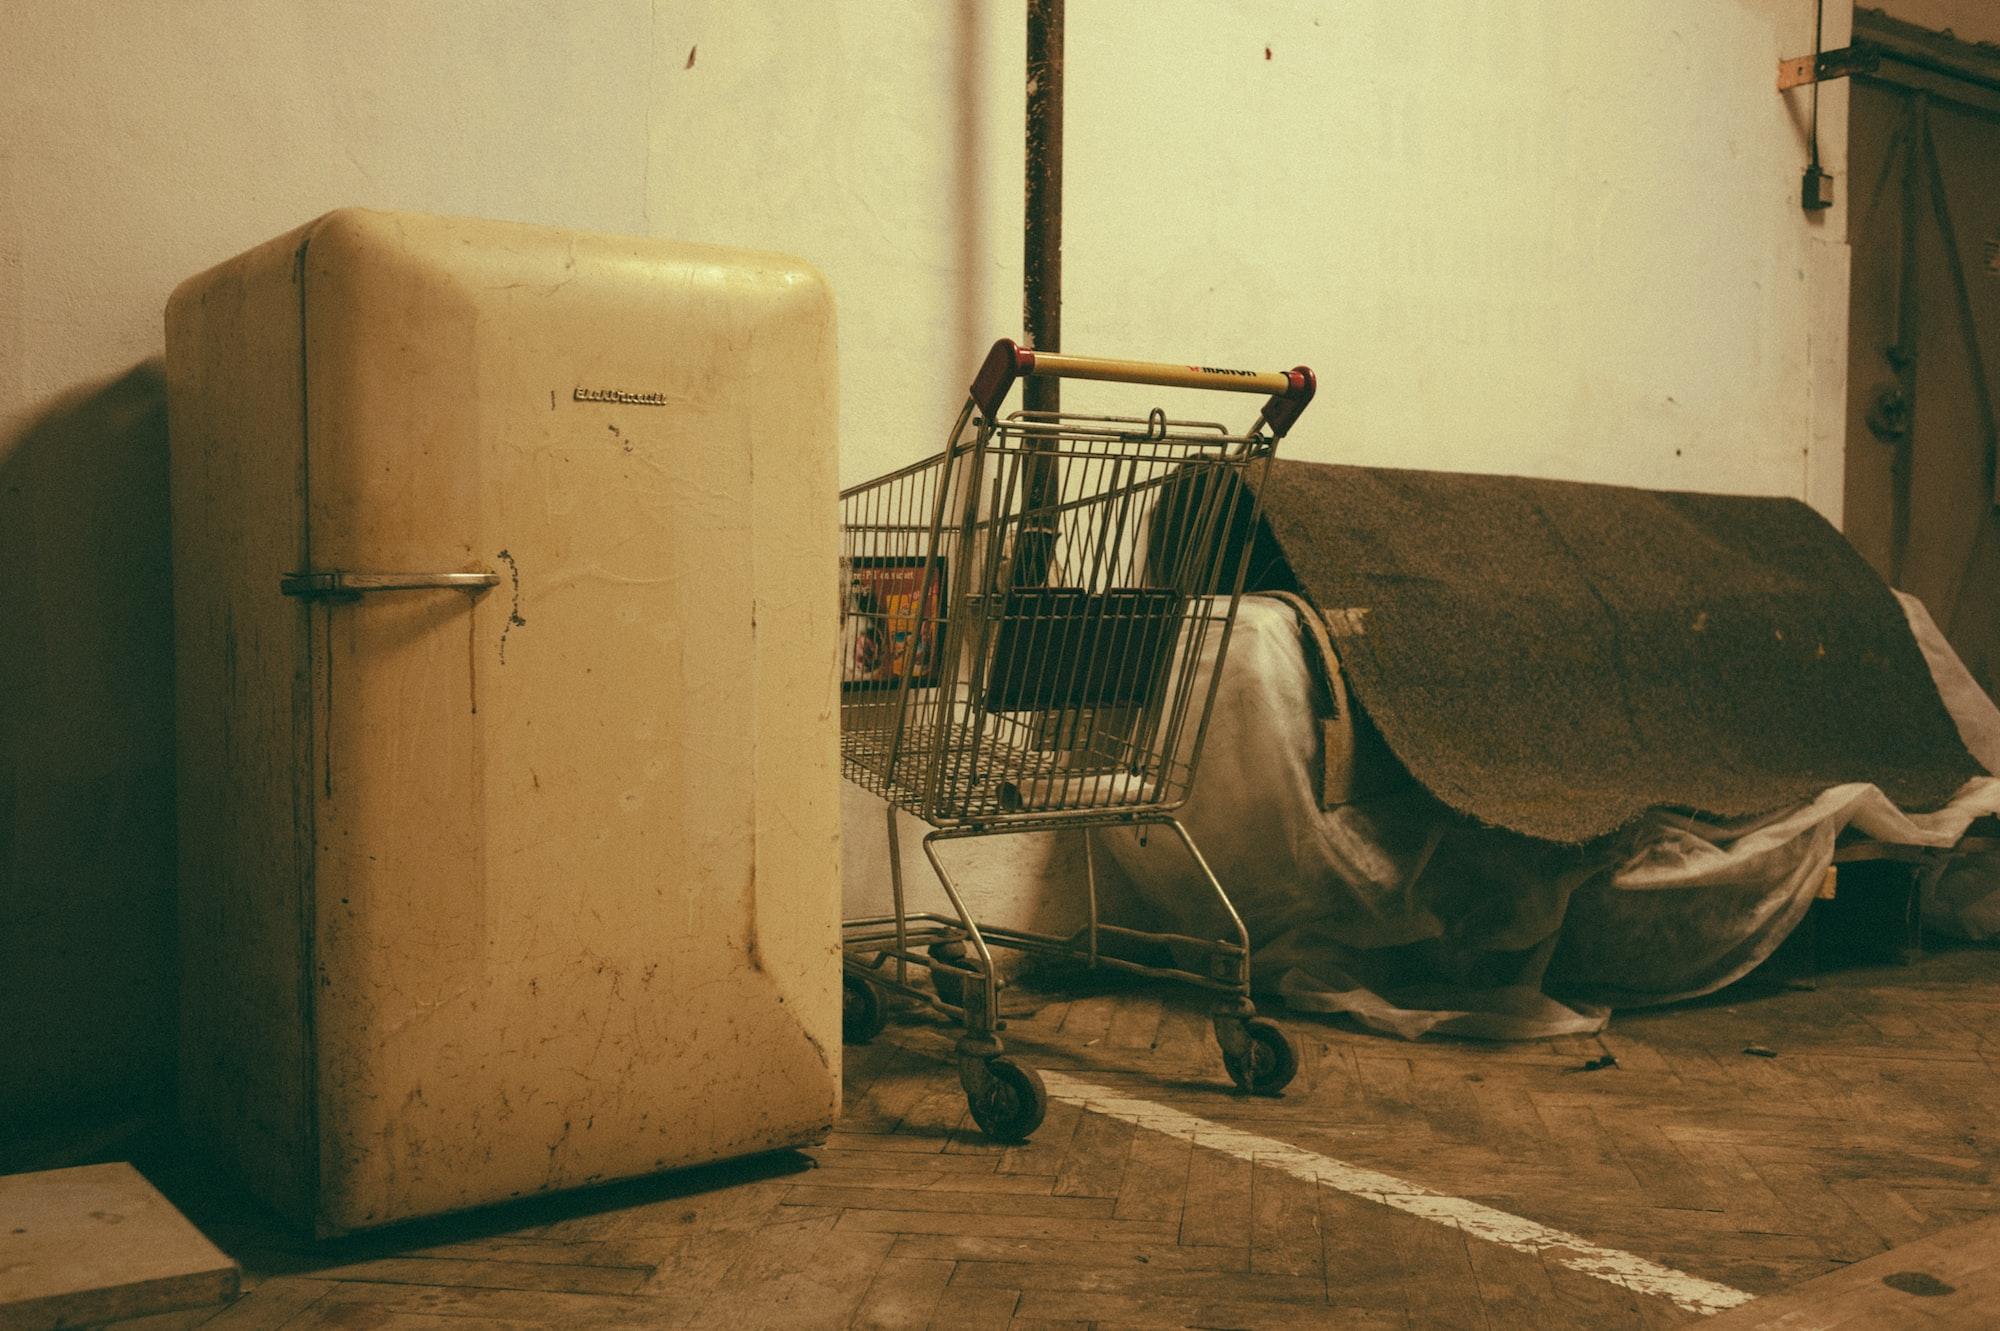 A-sad-abandoned-cart